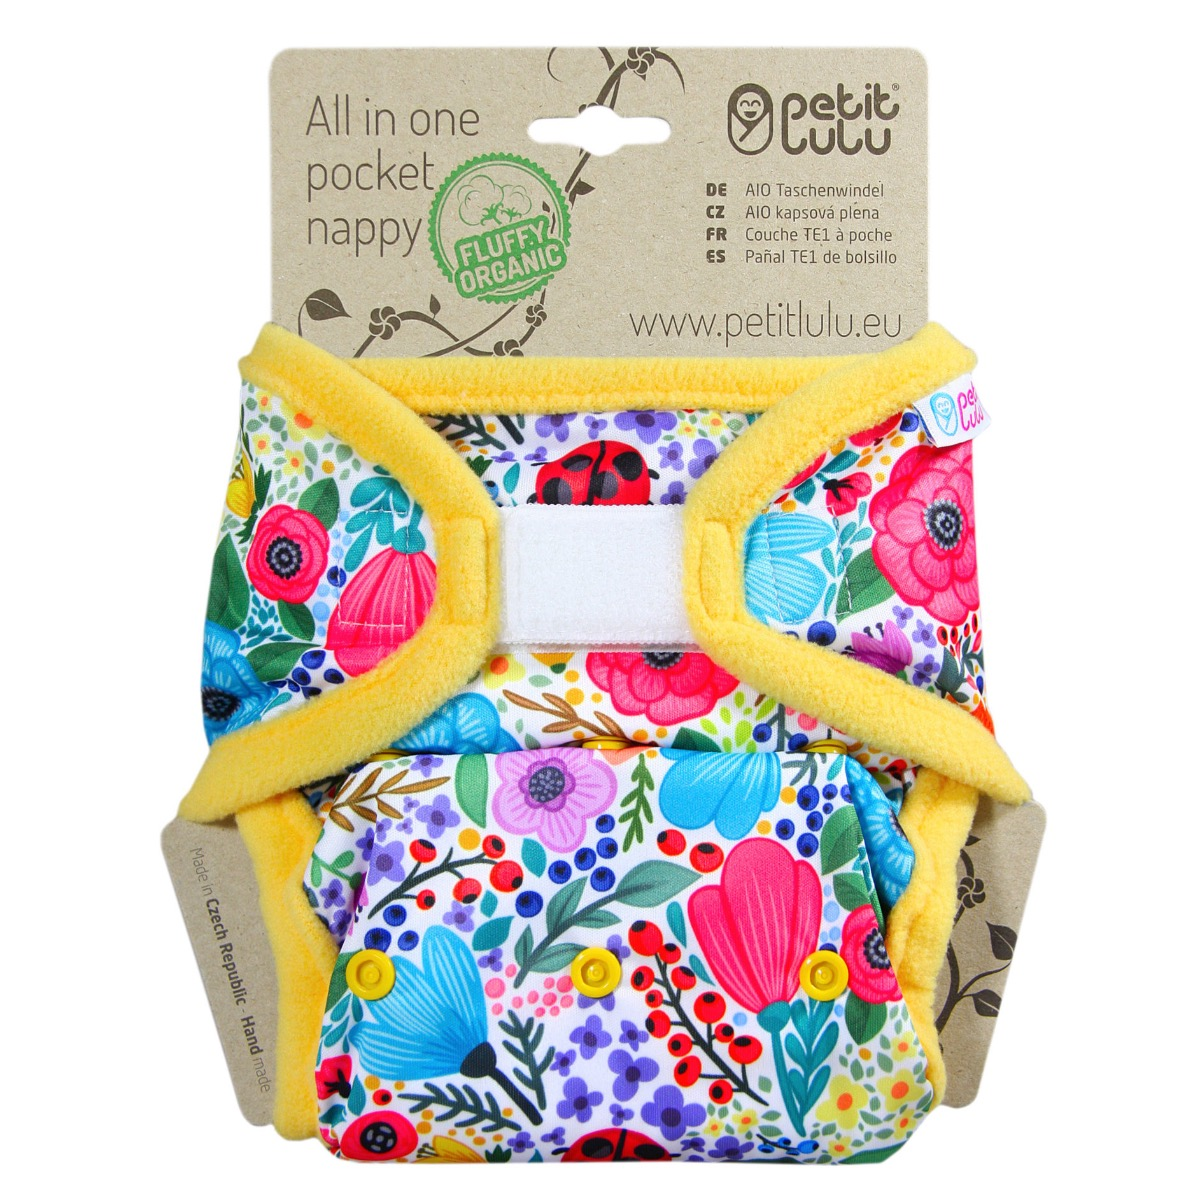 101978-rozkvetla-zahrada-all-in-one-pocket-nappy-sz-scaled.jpg